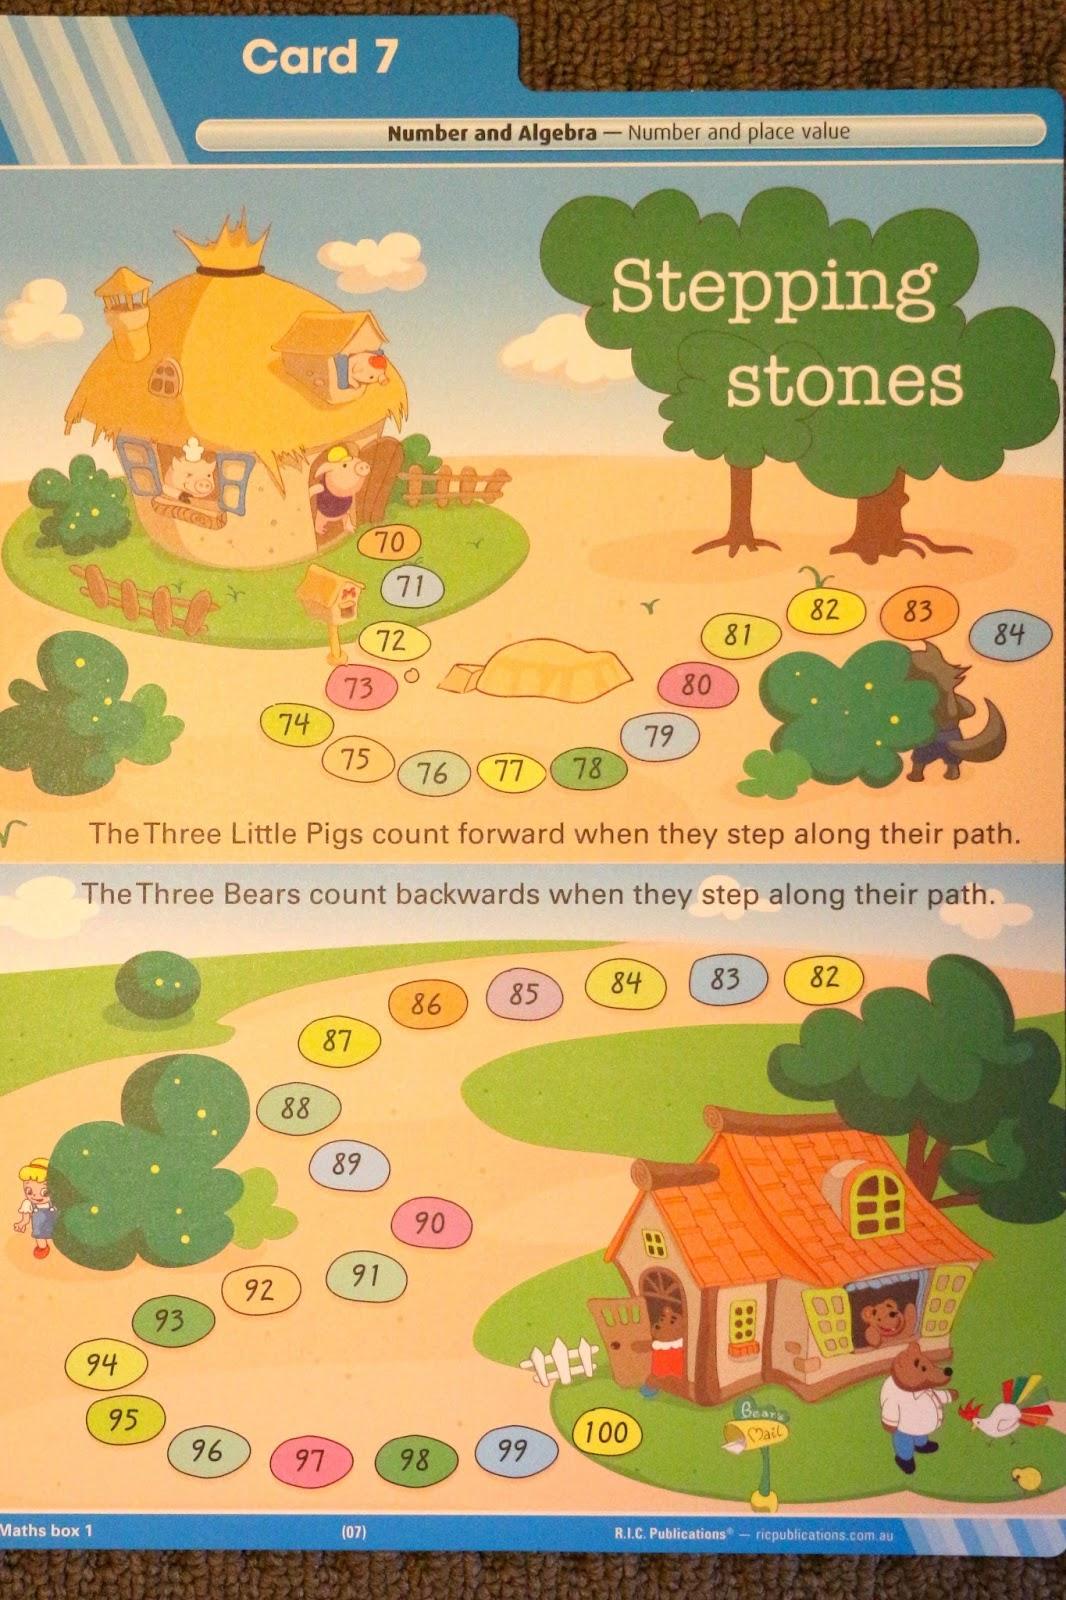 The Maths Box Part 2